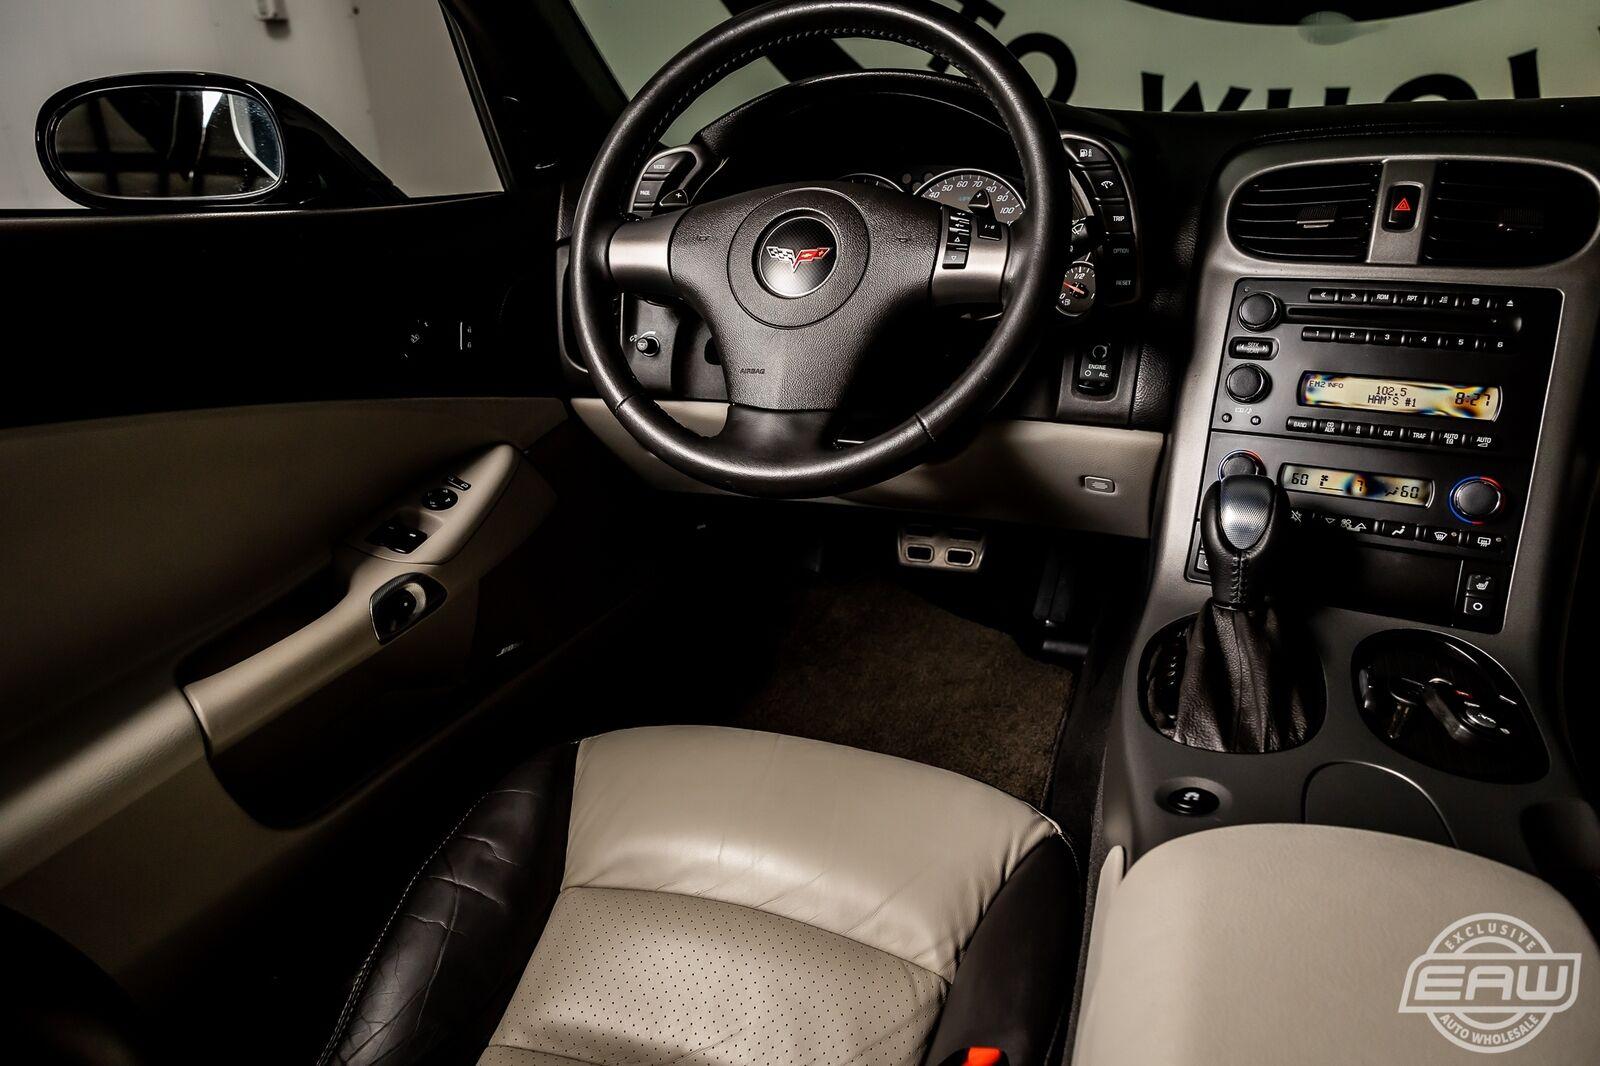 2007 Black Chevrolet Corvette Coupe  | C6 Corvette Photo 7